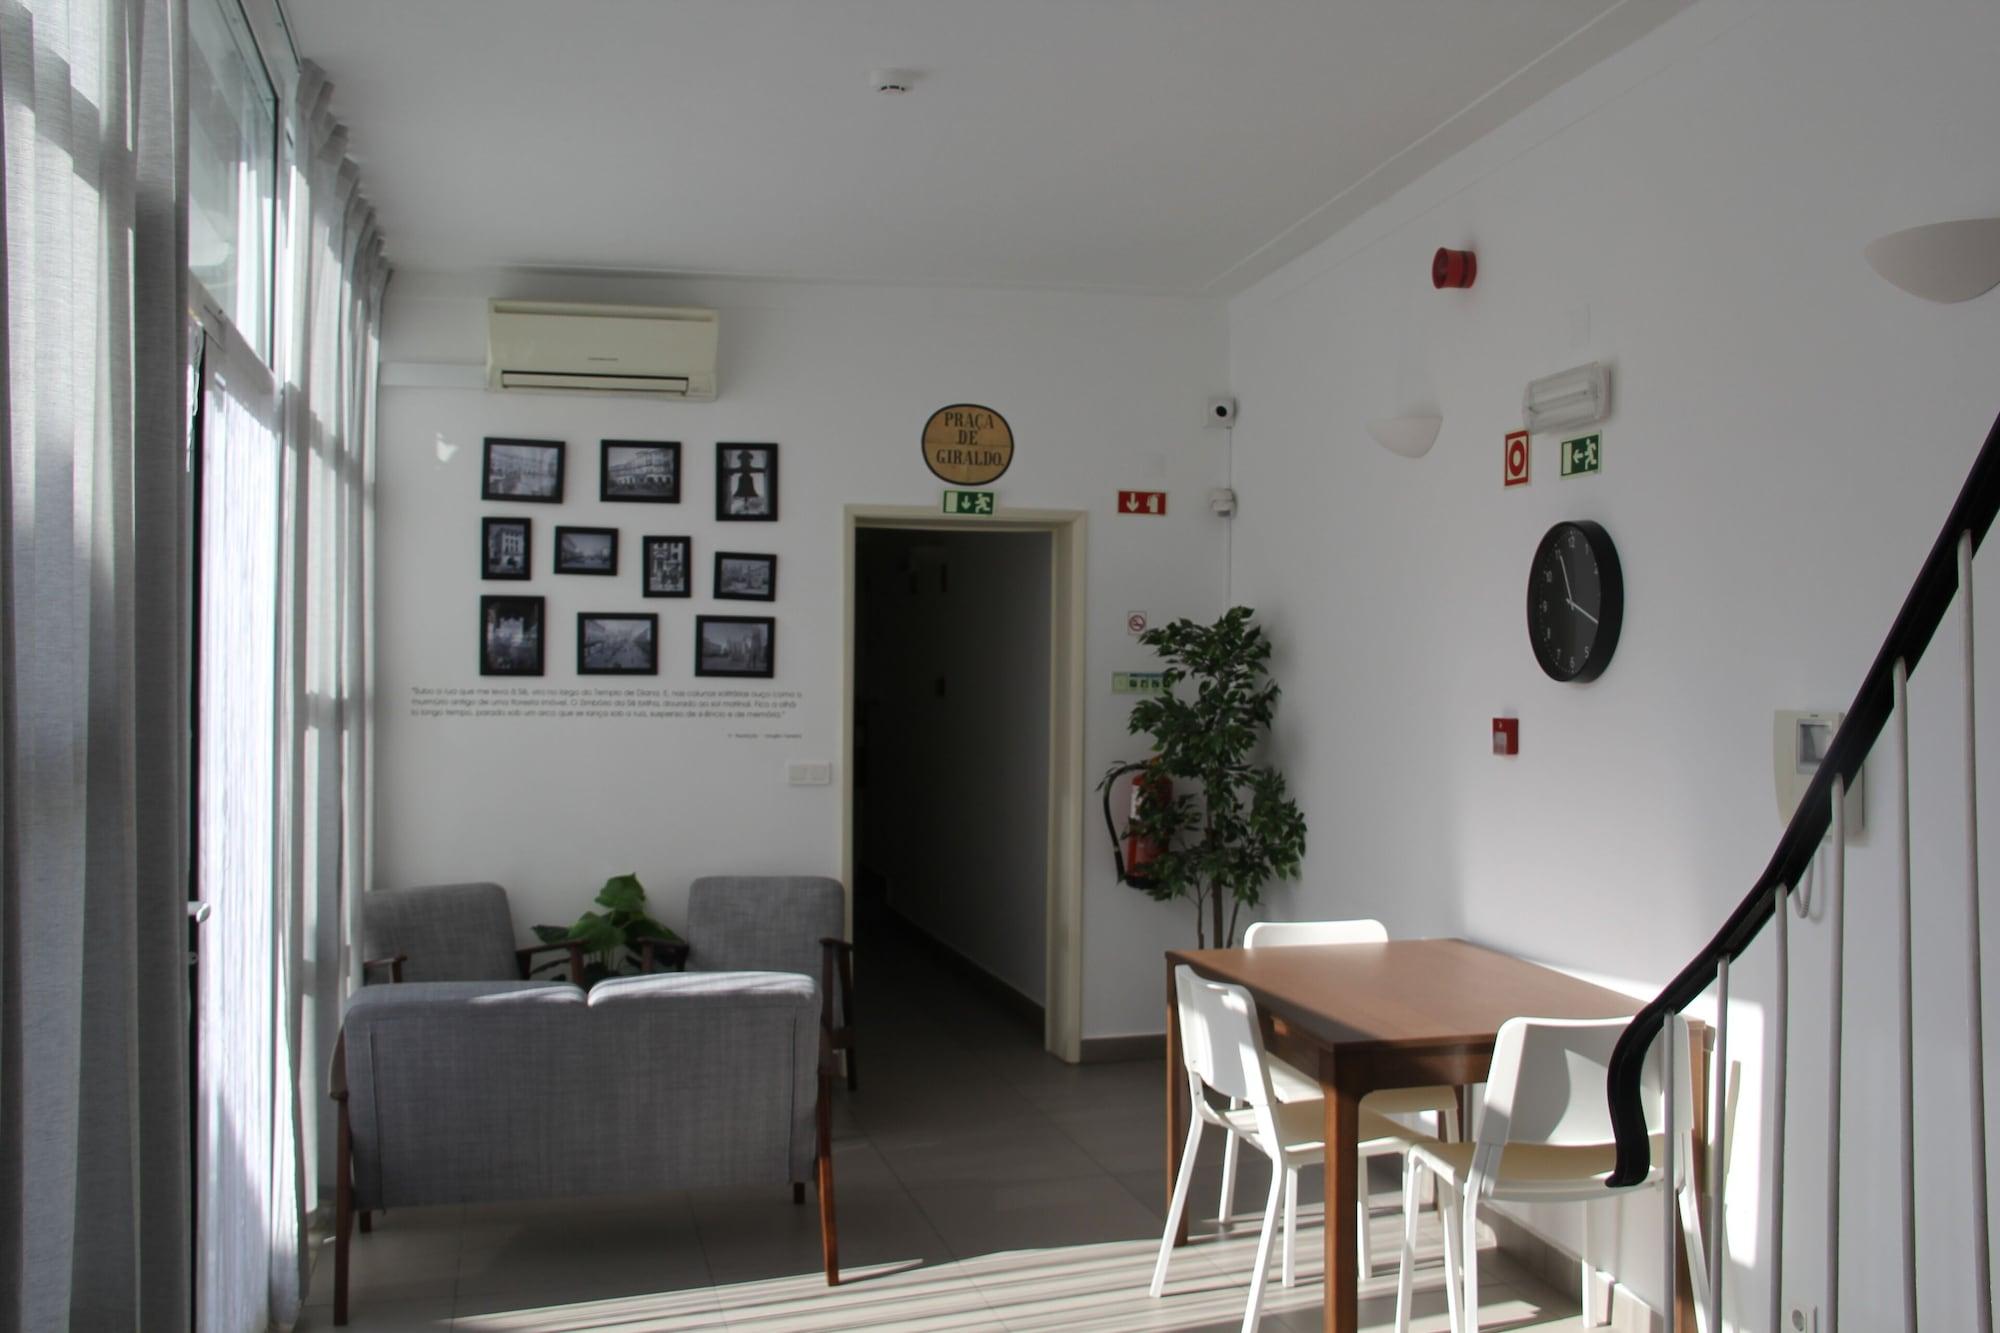 StayInn City - Évora, Évora